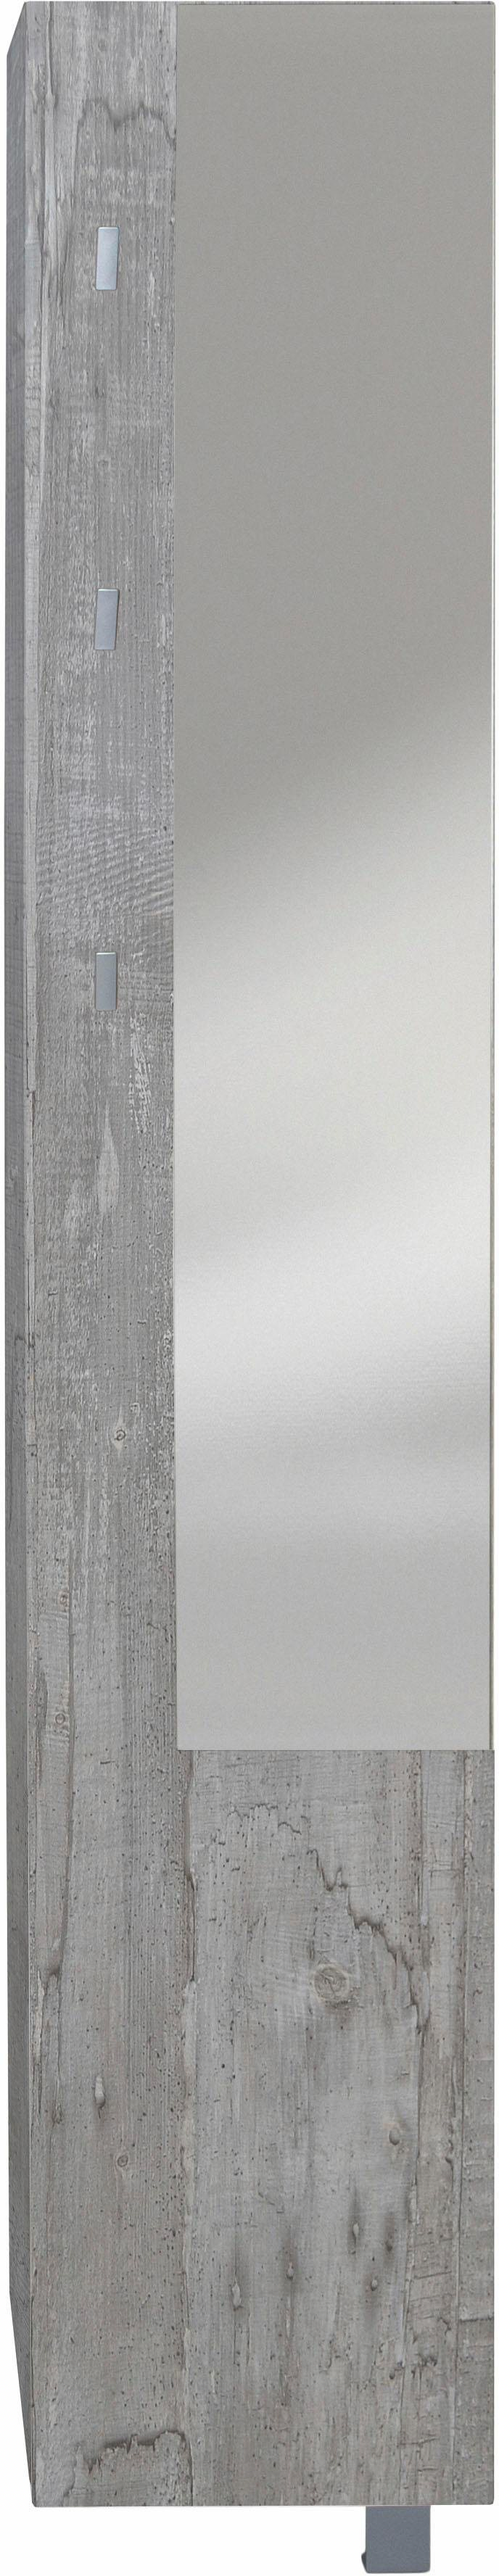 28 sparen drehbarer schuhschrank woody 3 nur 179 99 cherry m bel. Black Bedroom Furniture Sets. Home Design Ideas